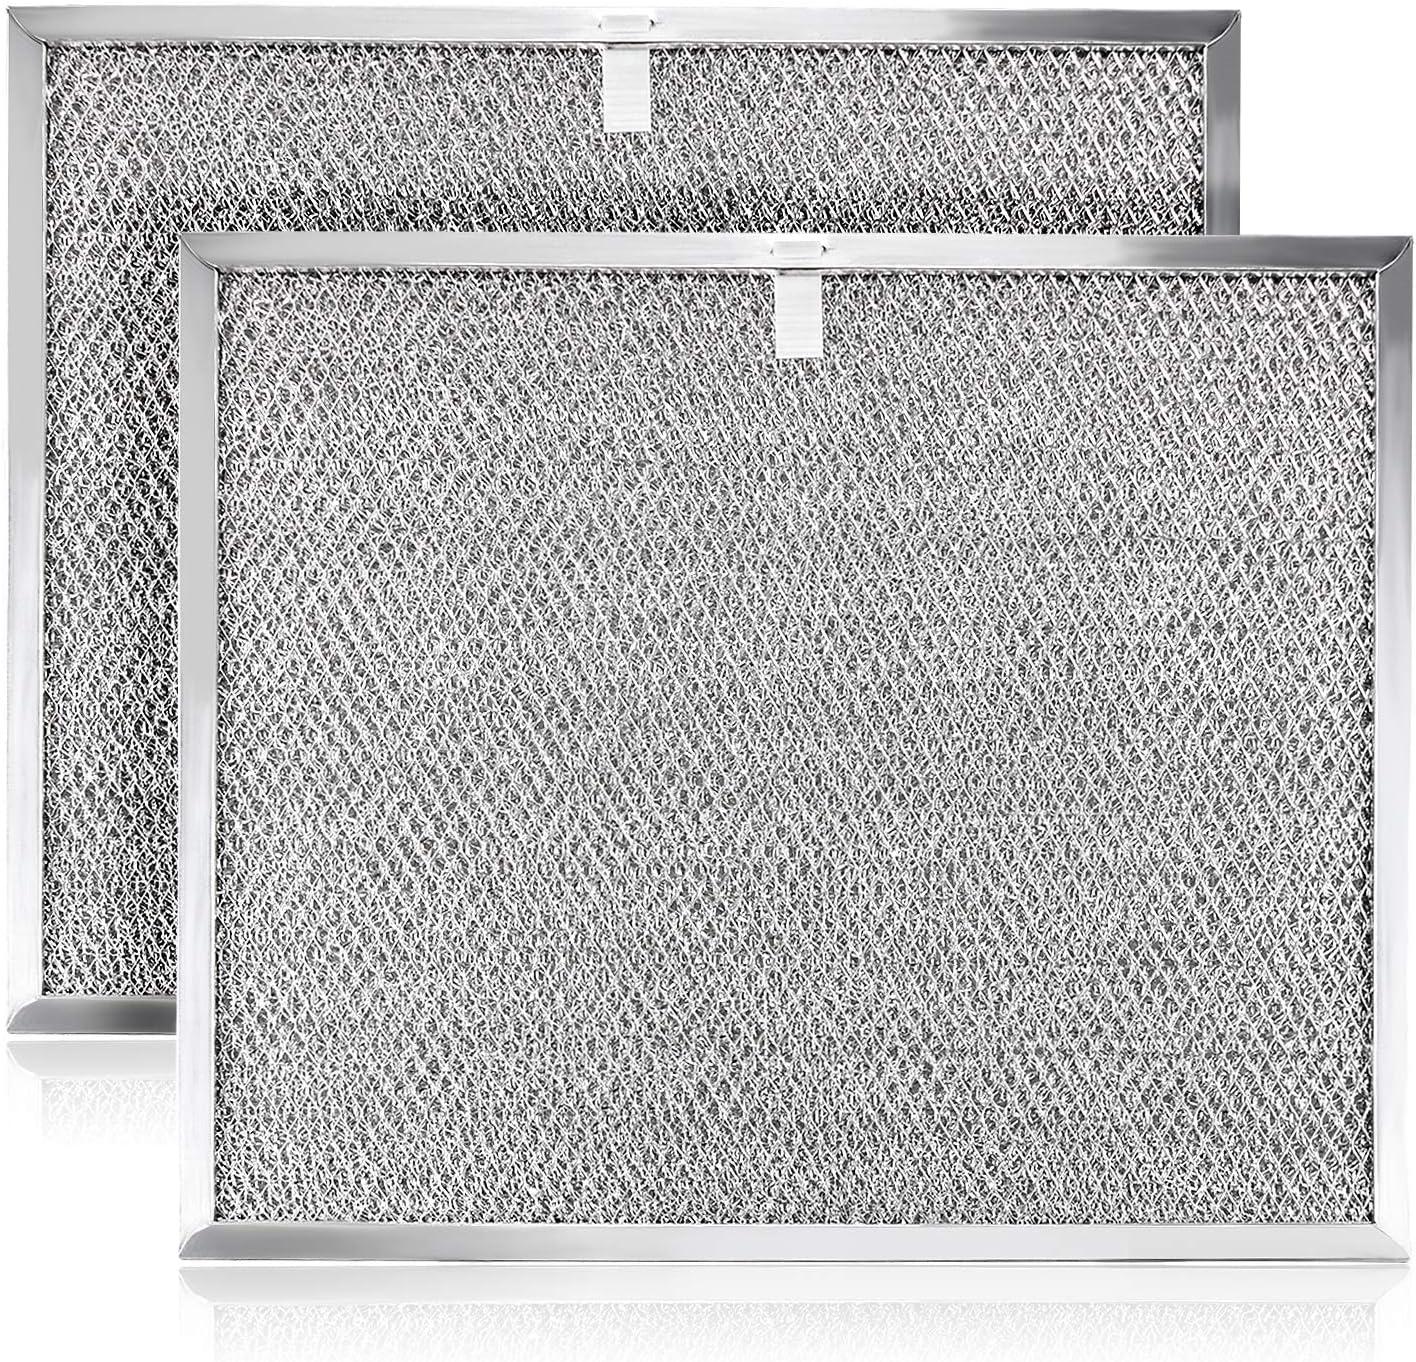 2021 spring and summer new Fetechmate Range Hood half Filter Com Aluminum BPS1FA30 Grease